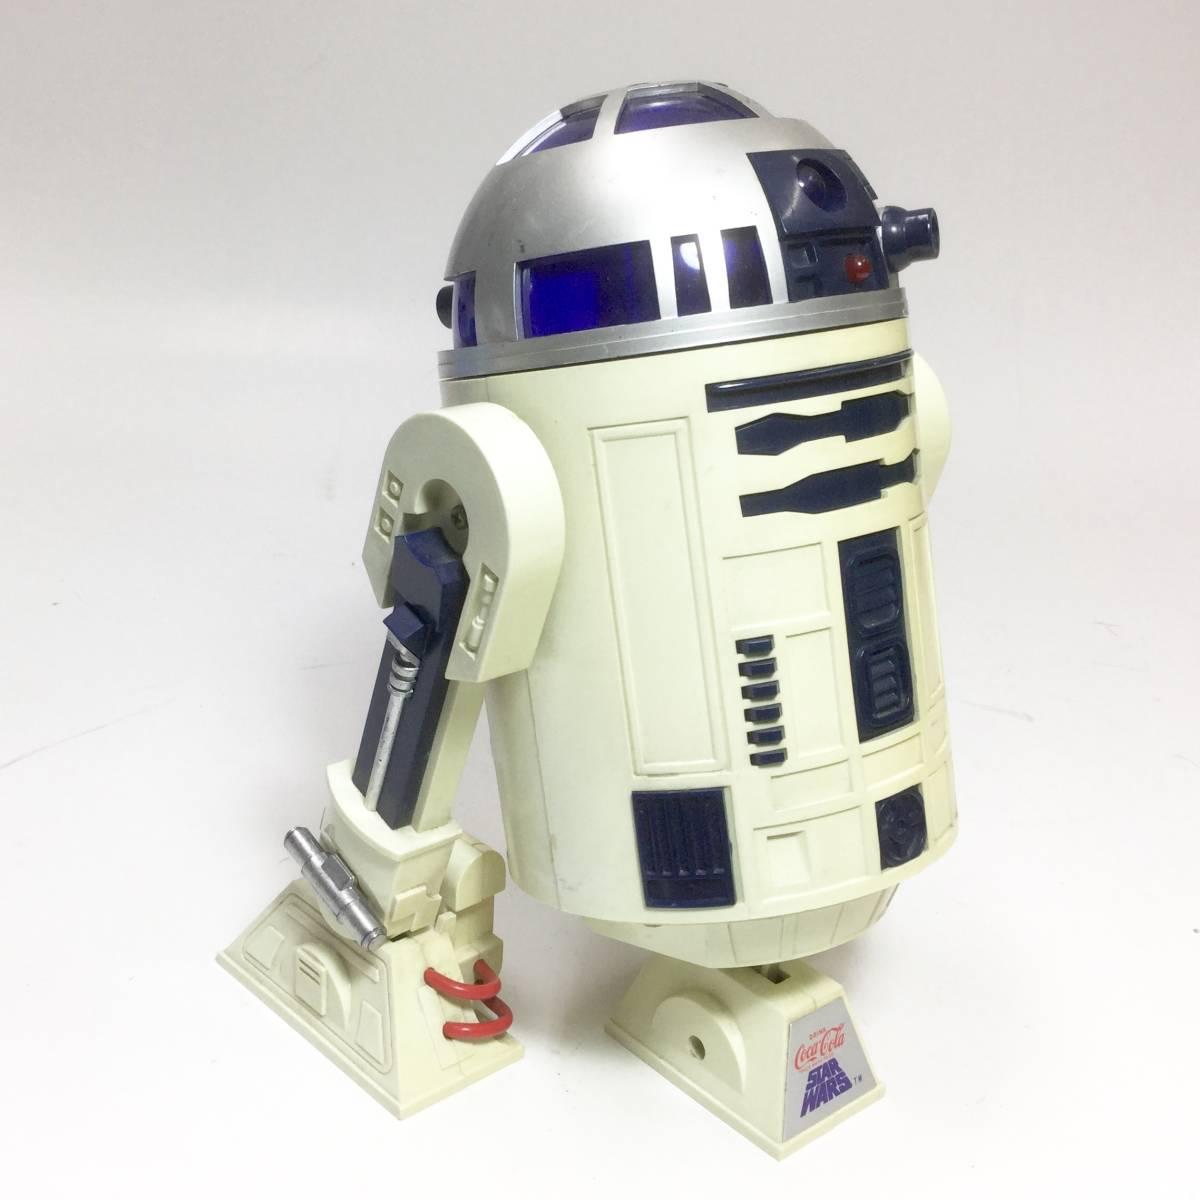 R2-D2 ラジオ 作動品 スターウォーズ 1977年版 コカコーラ 懸賞品 非売品 レトロ ビンテージ _画像3